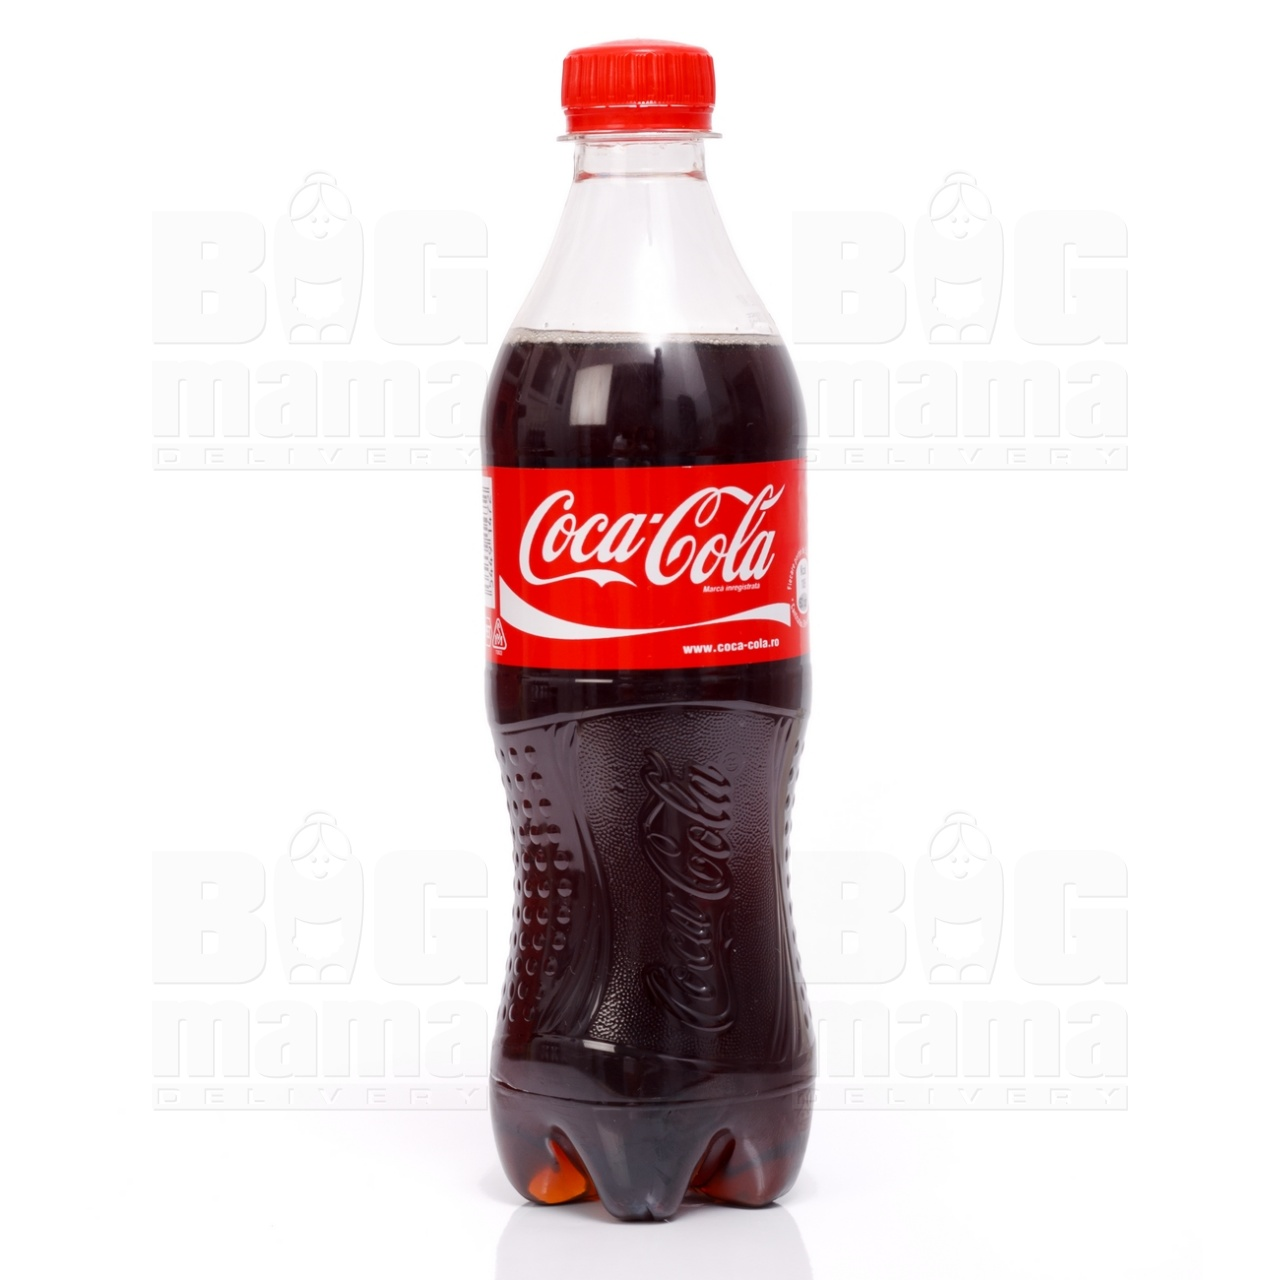 Product #126 image - Coca-Cola 0,5L